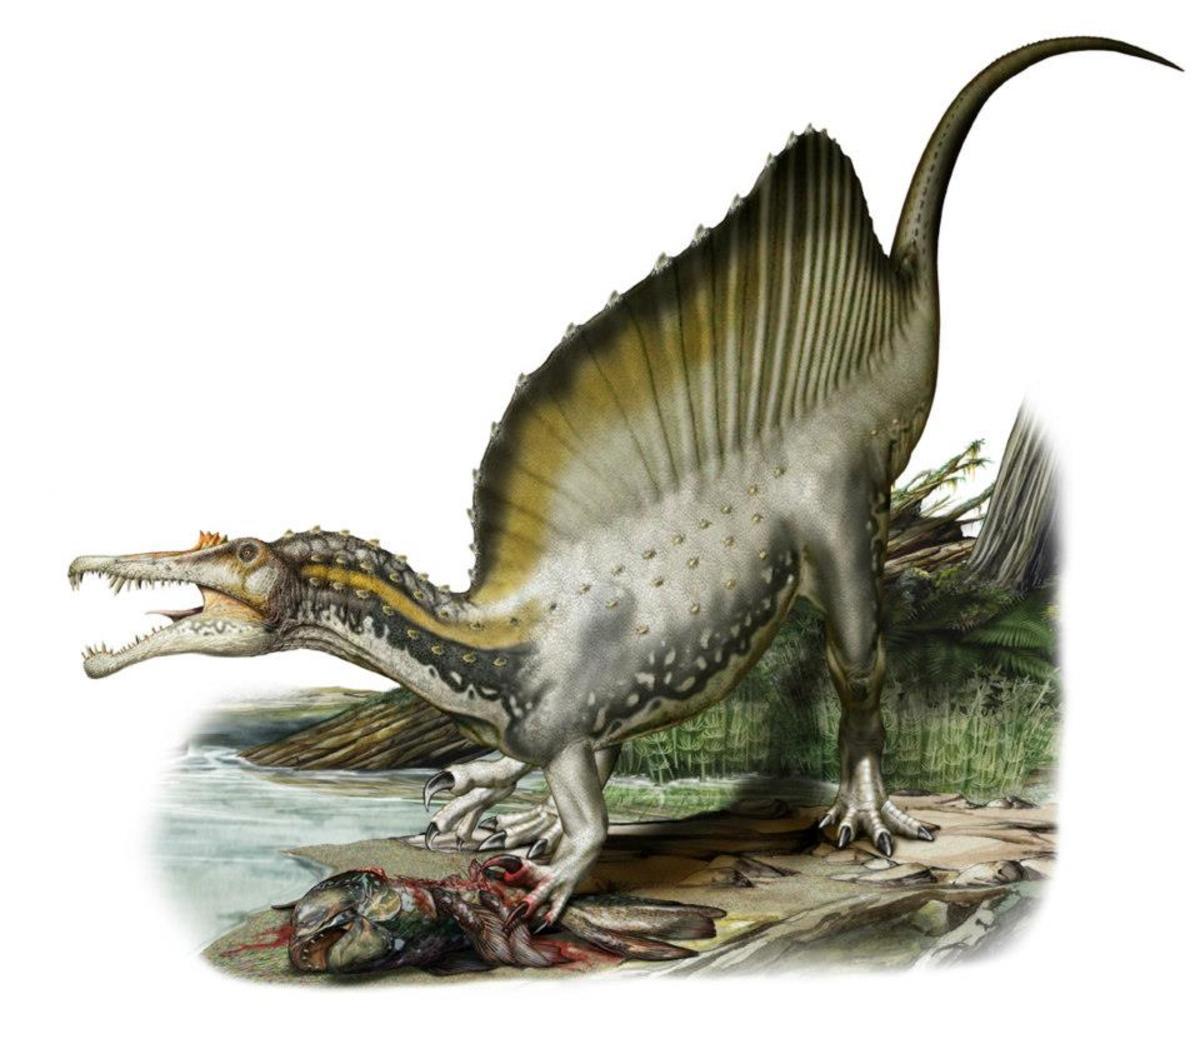 Spinosaurus slashing into a coelacanth, by Davide Bonadonna.